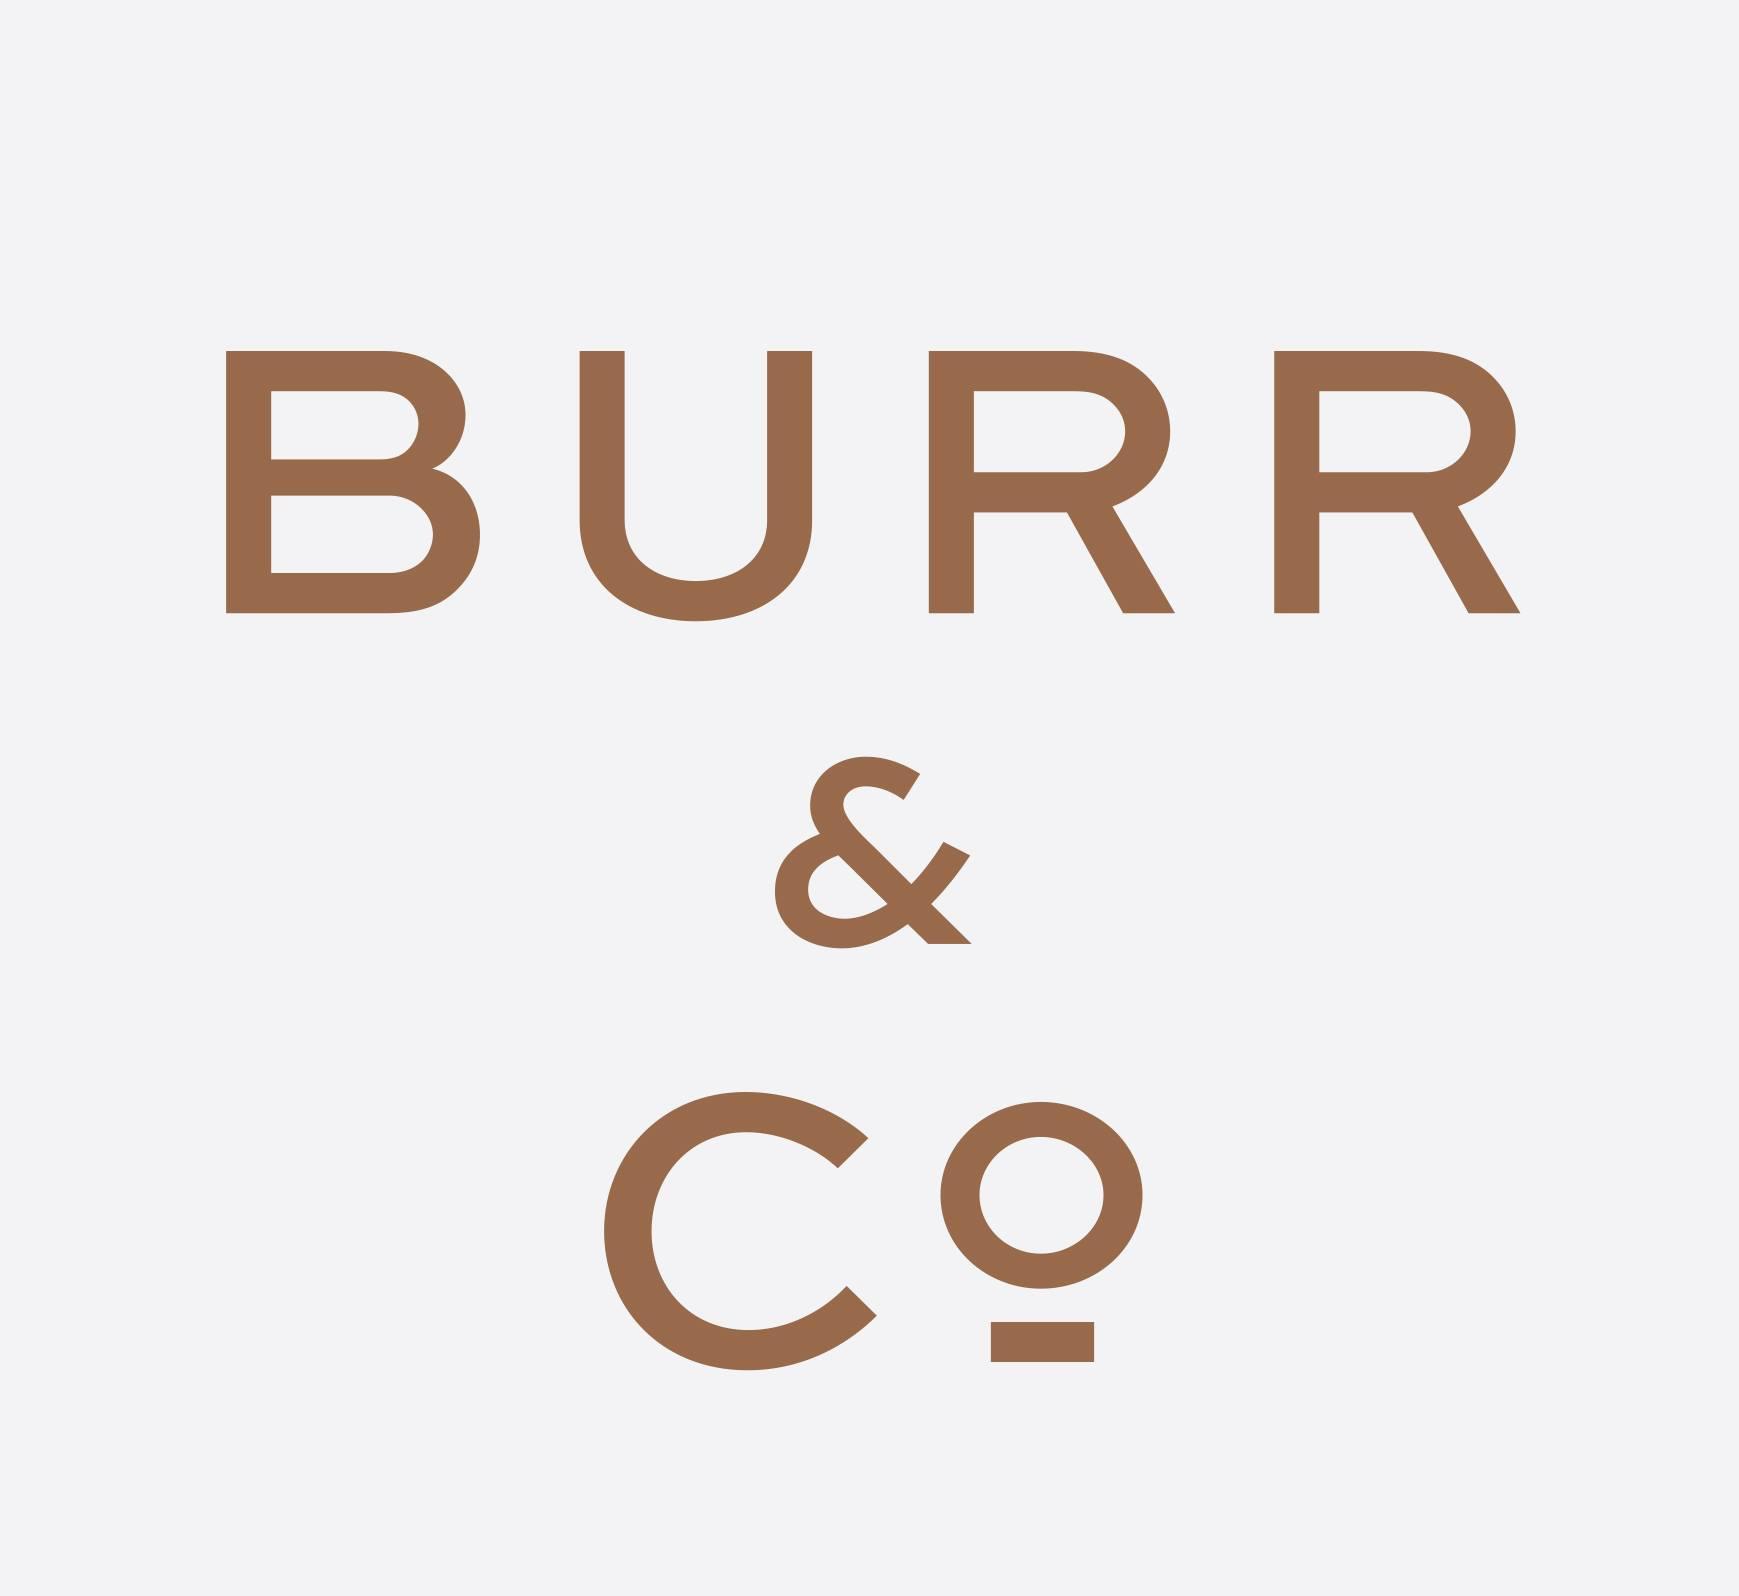 Burr & Co